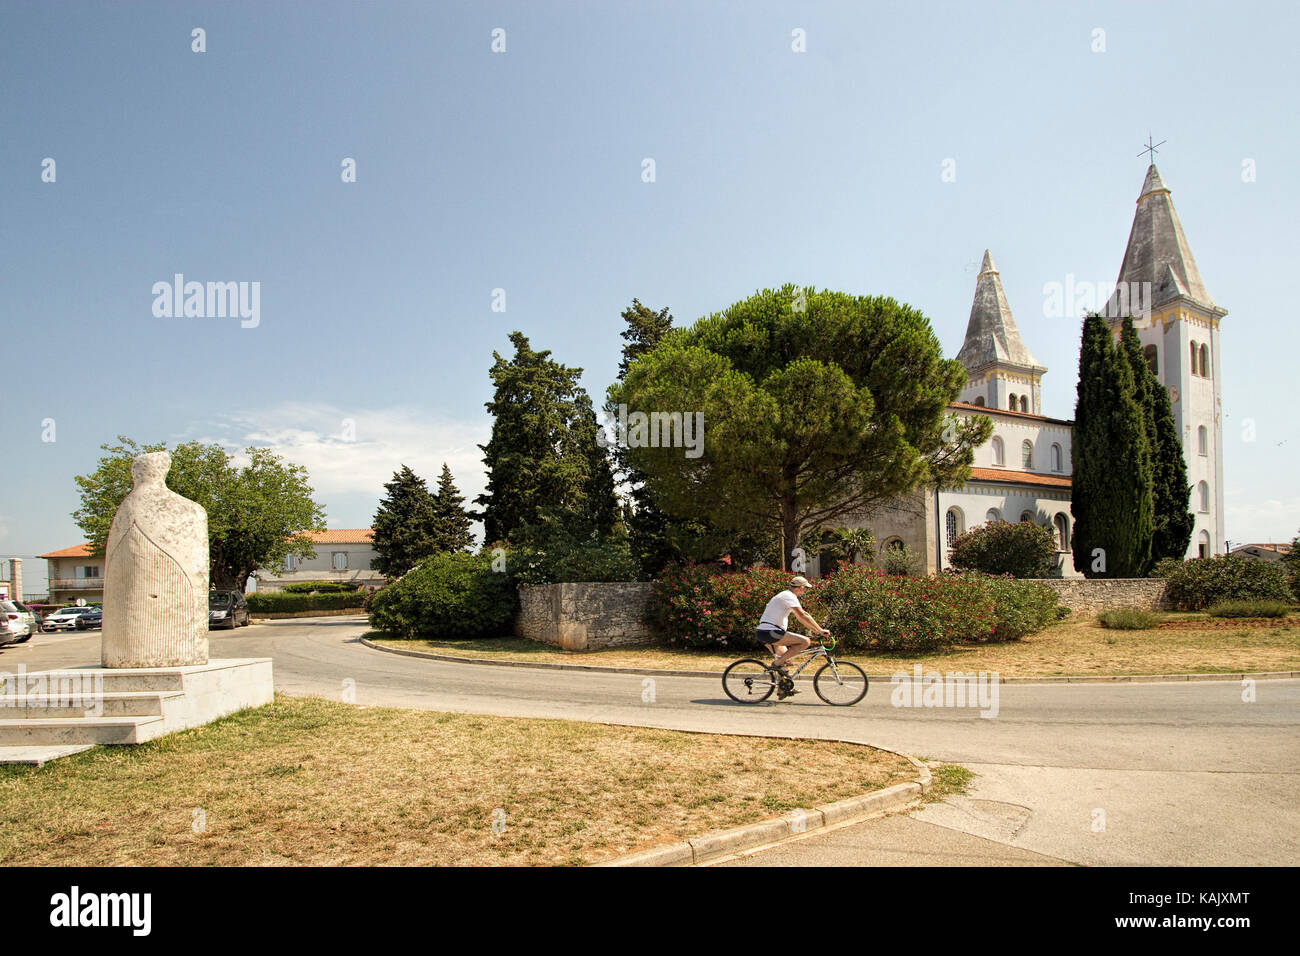 Saint Agnes Roman Catholic Church, in the Croatian resort of Medulin - Stock Image